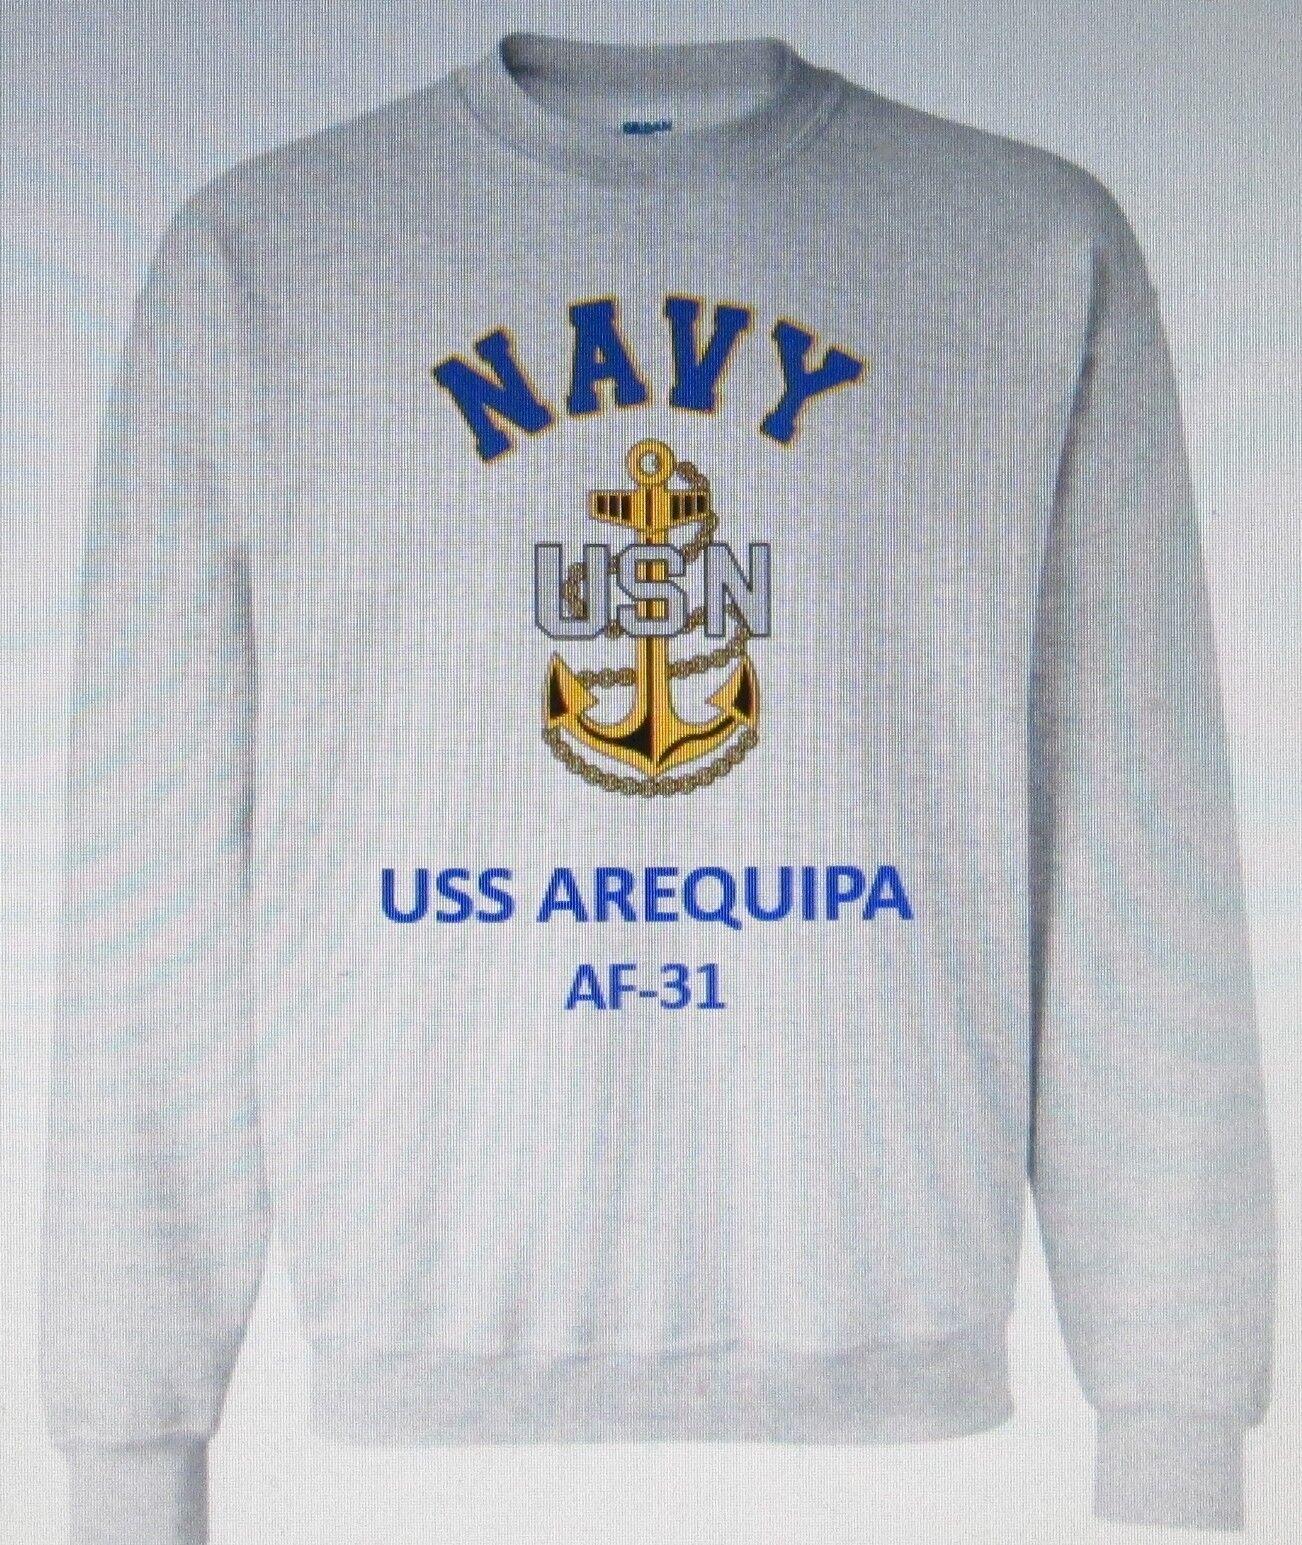 USS AREQUIPA  AF-31  STORES SHIP  NAVY ANCHOR EMBLEM SWEATSHIRT